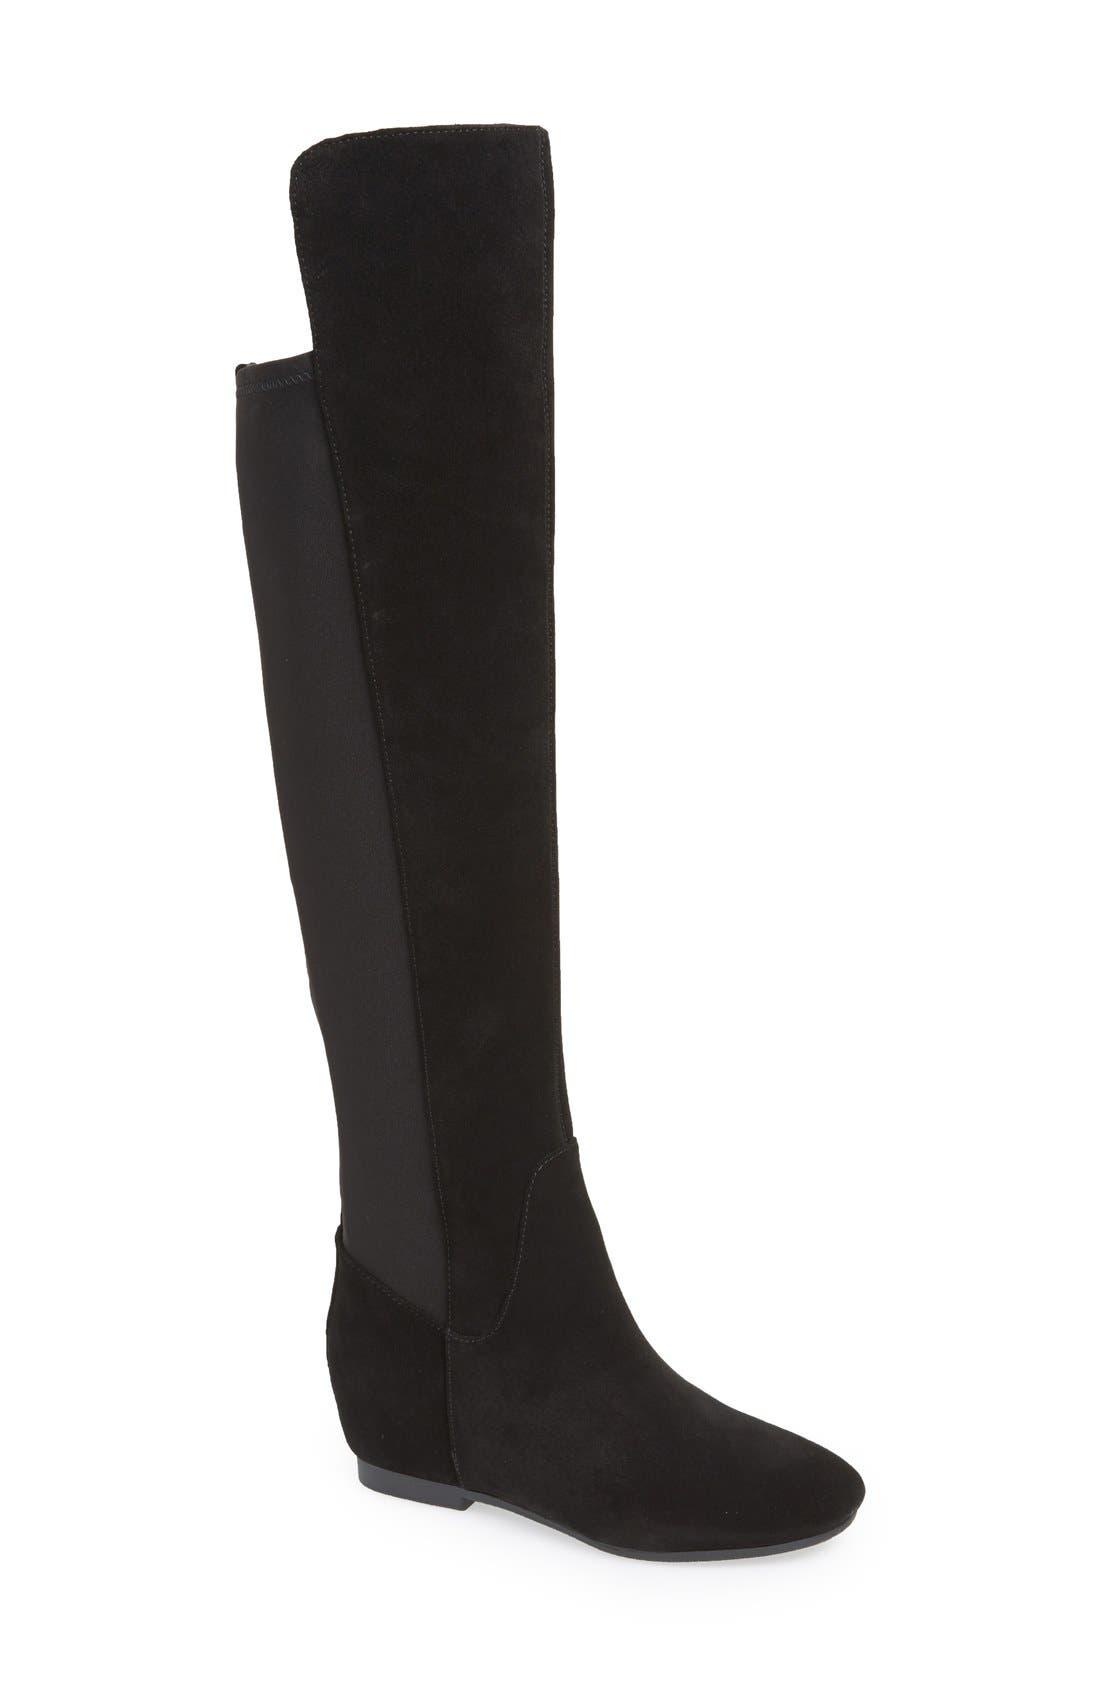 Alternate Image 1 Selected - Nine West 'Tiberia' Over the Knee Boot (Women)